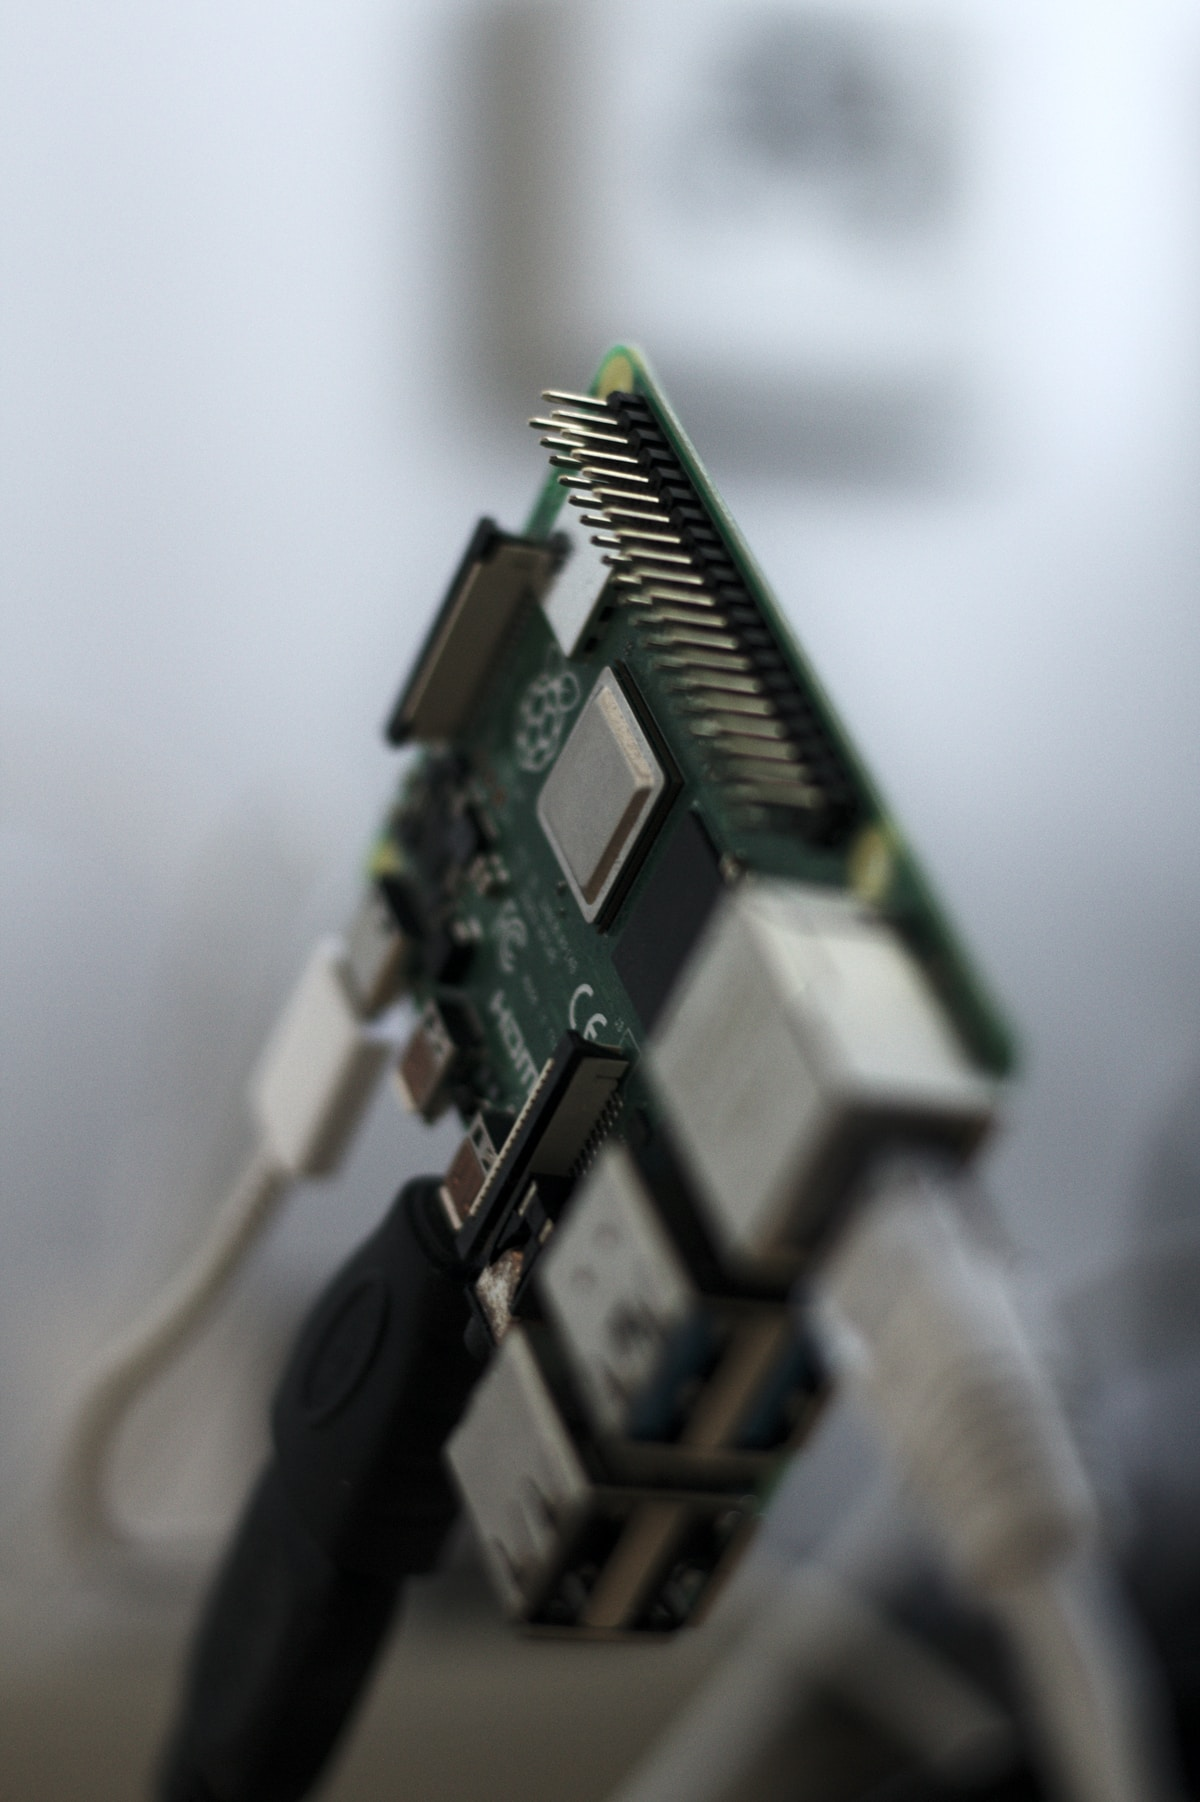 green and black computer ram stick